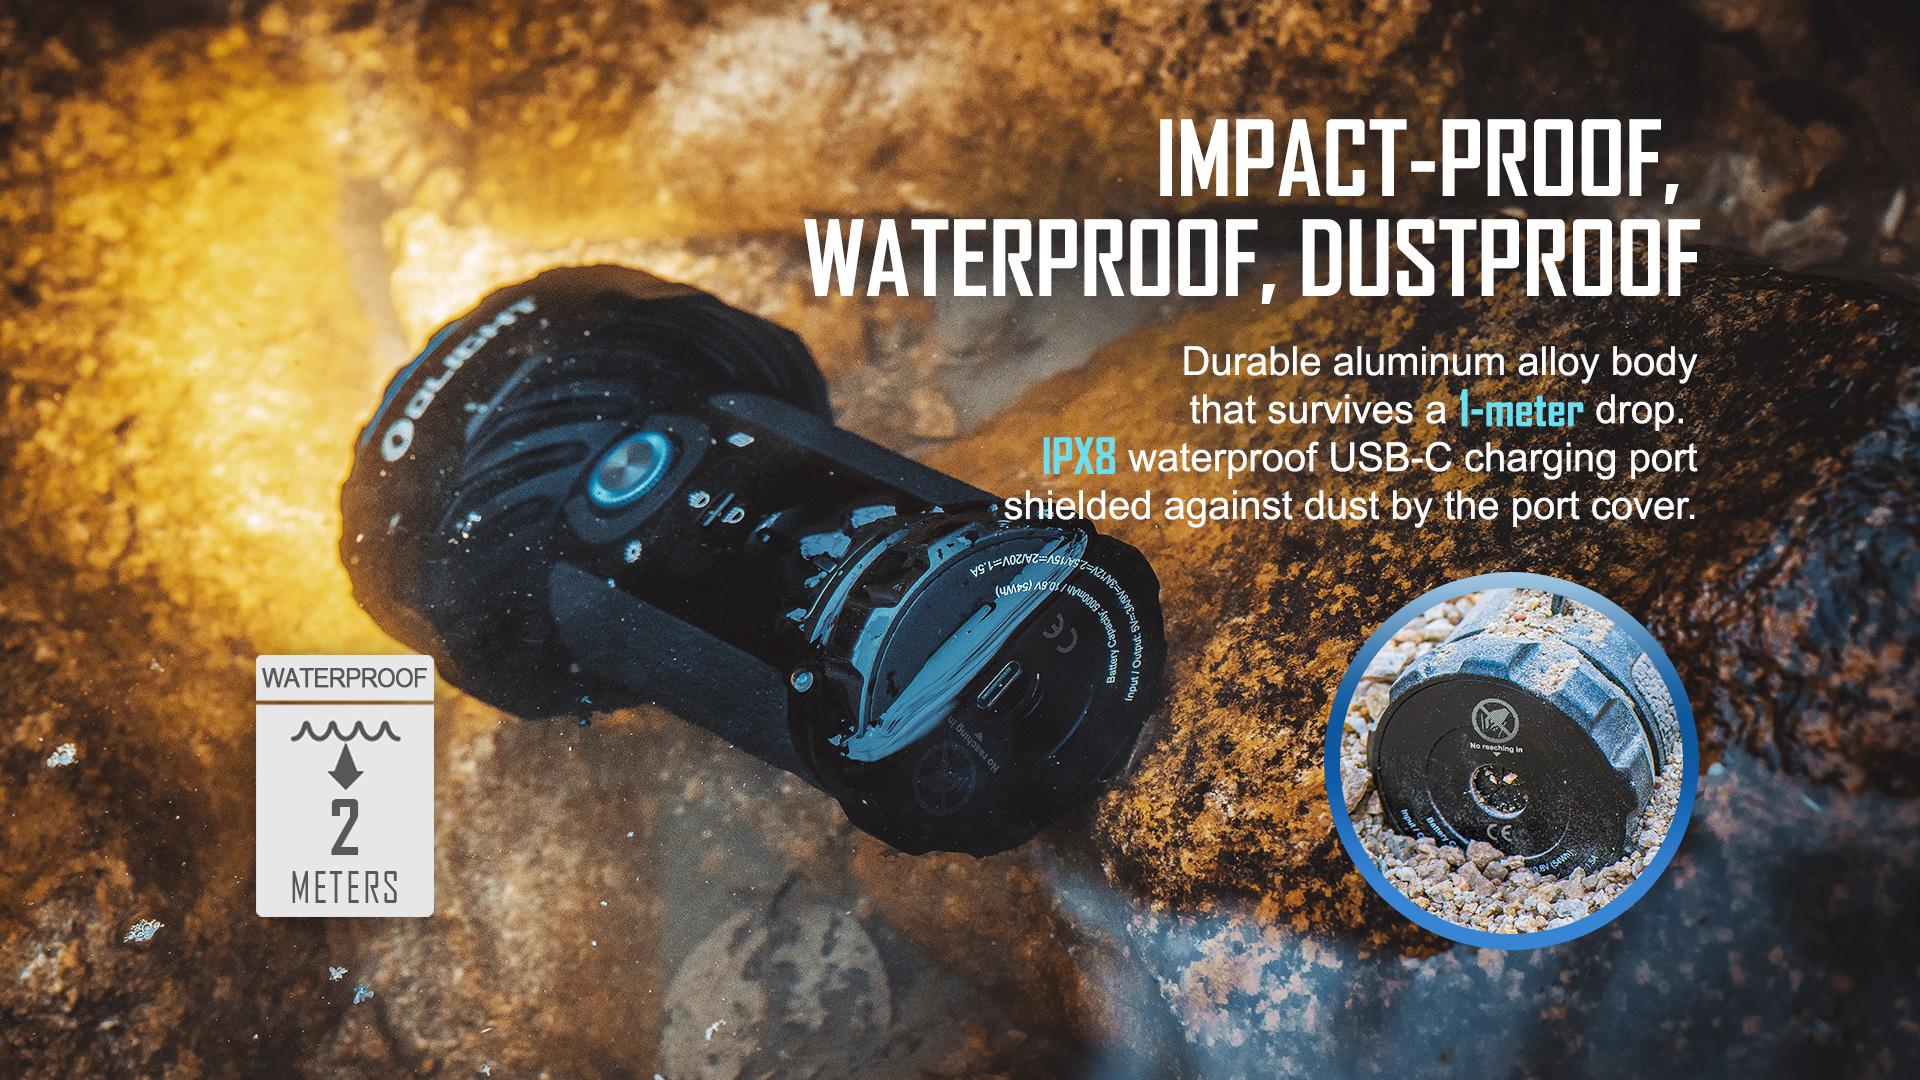 Marauder 2 with high waterproof performance